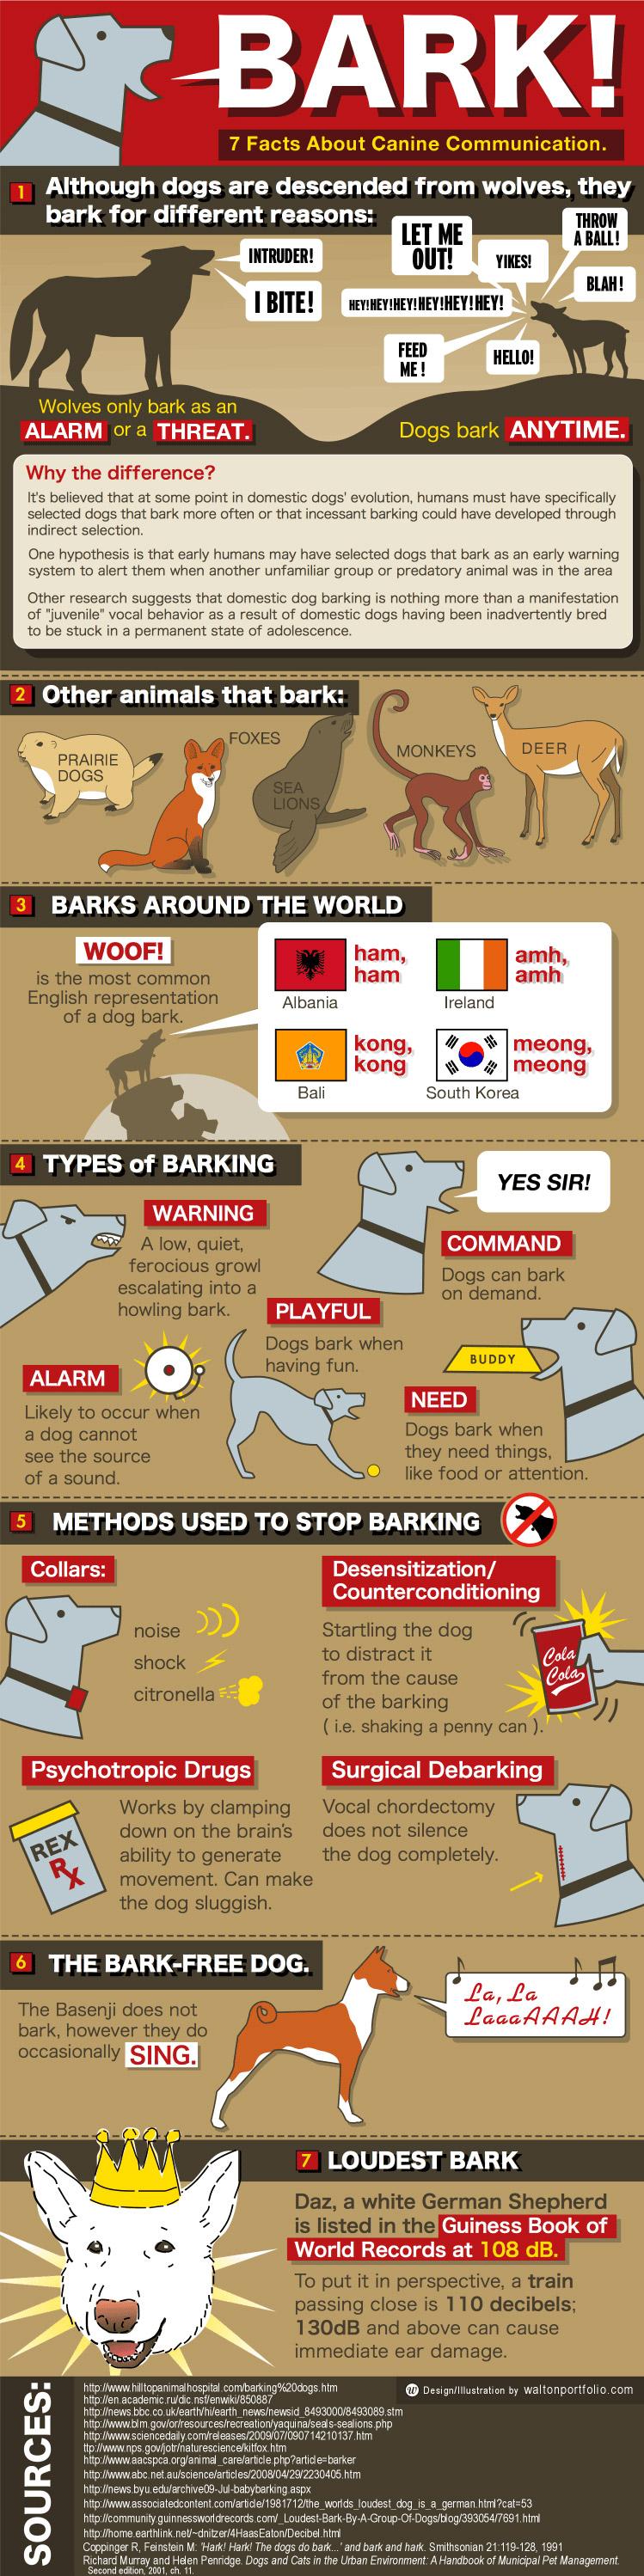 infografie latrat